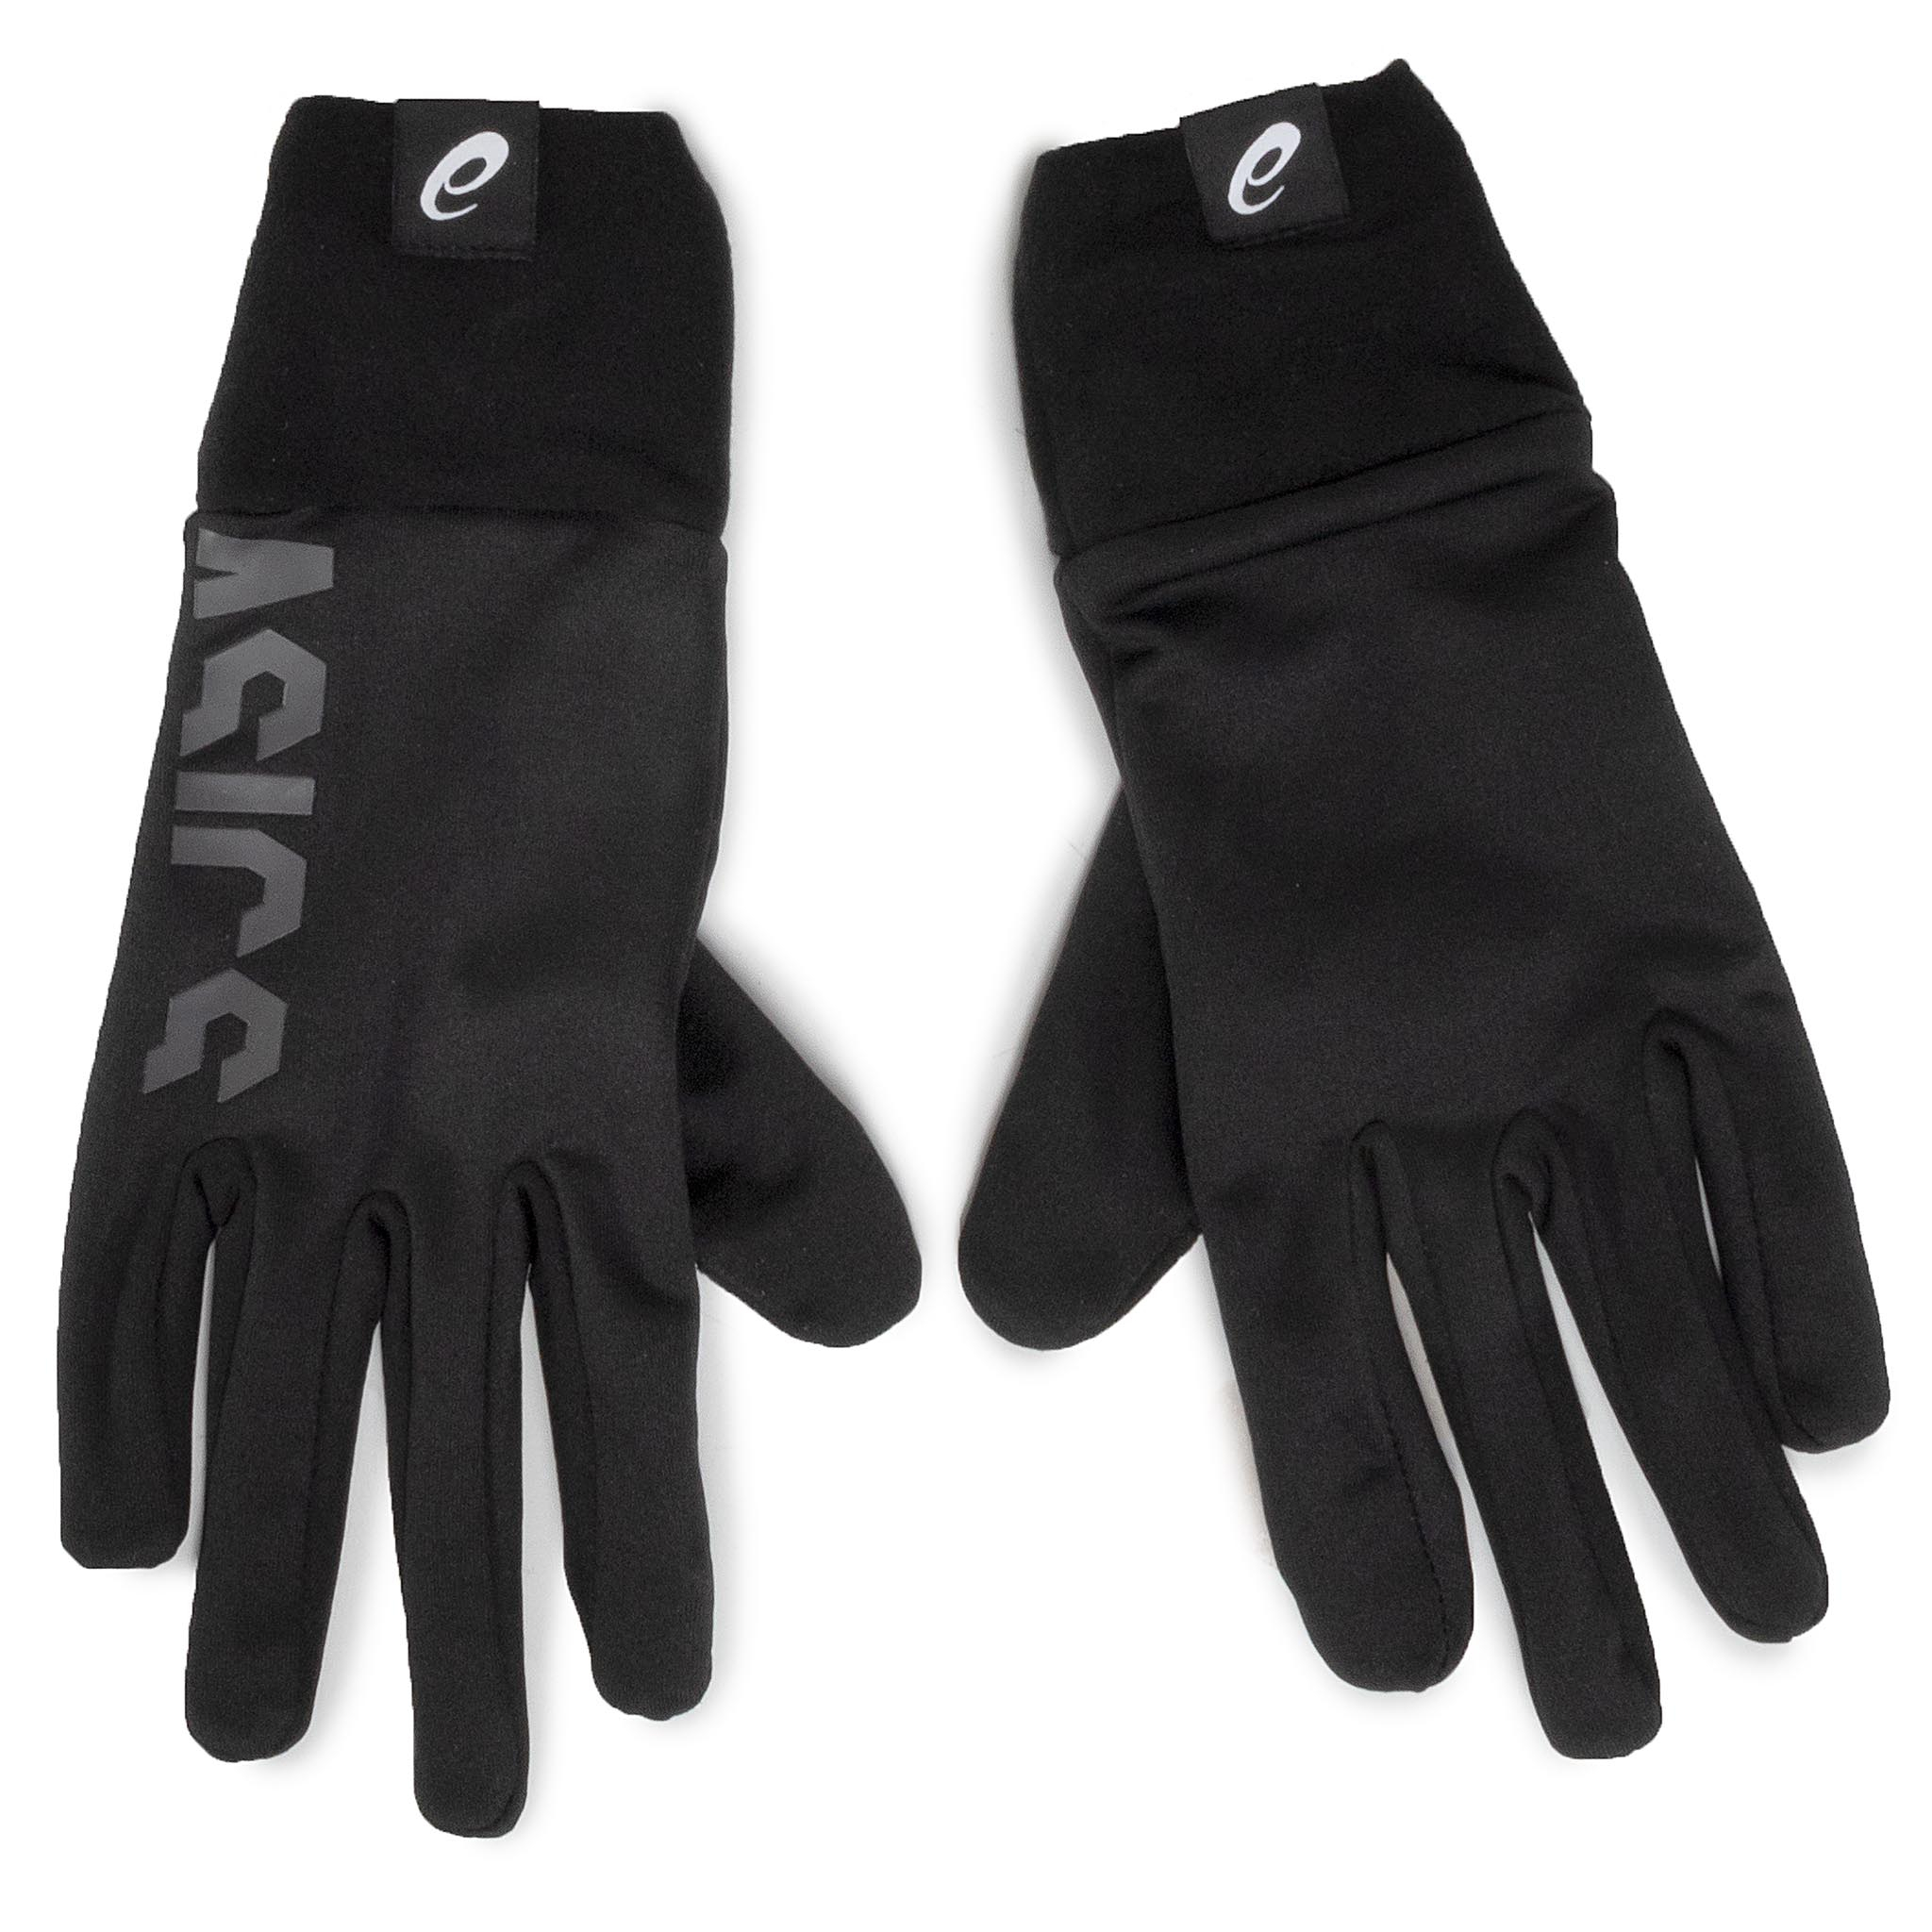 Image of Damenhandschuhe ASICS - Running Gloves 3013A033 Performance Black 001